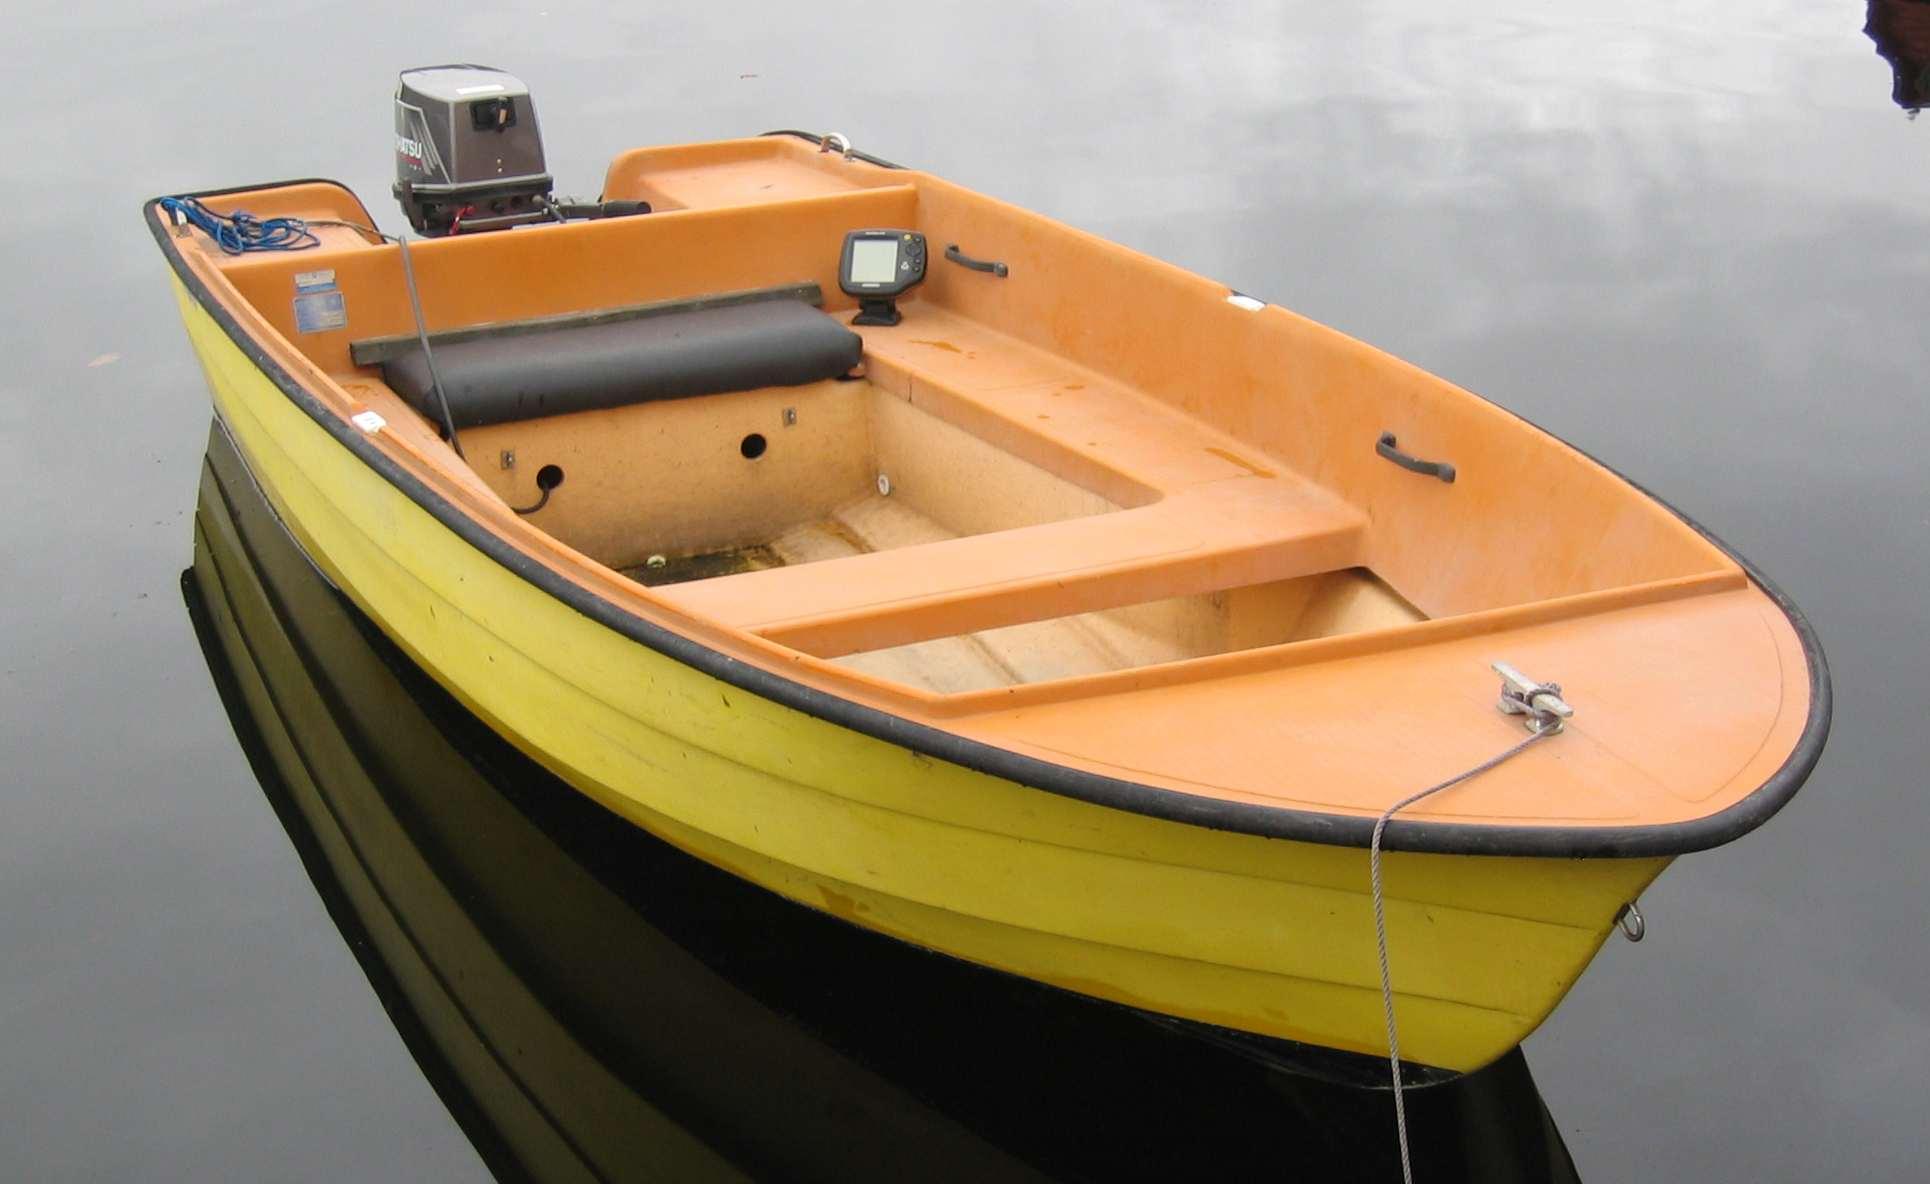 Boat HD wallpapers, Desktop wallpaper - most viewed